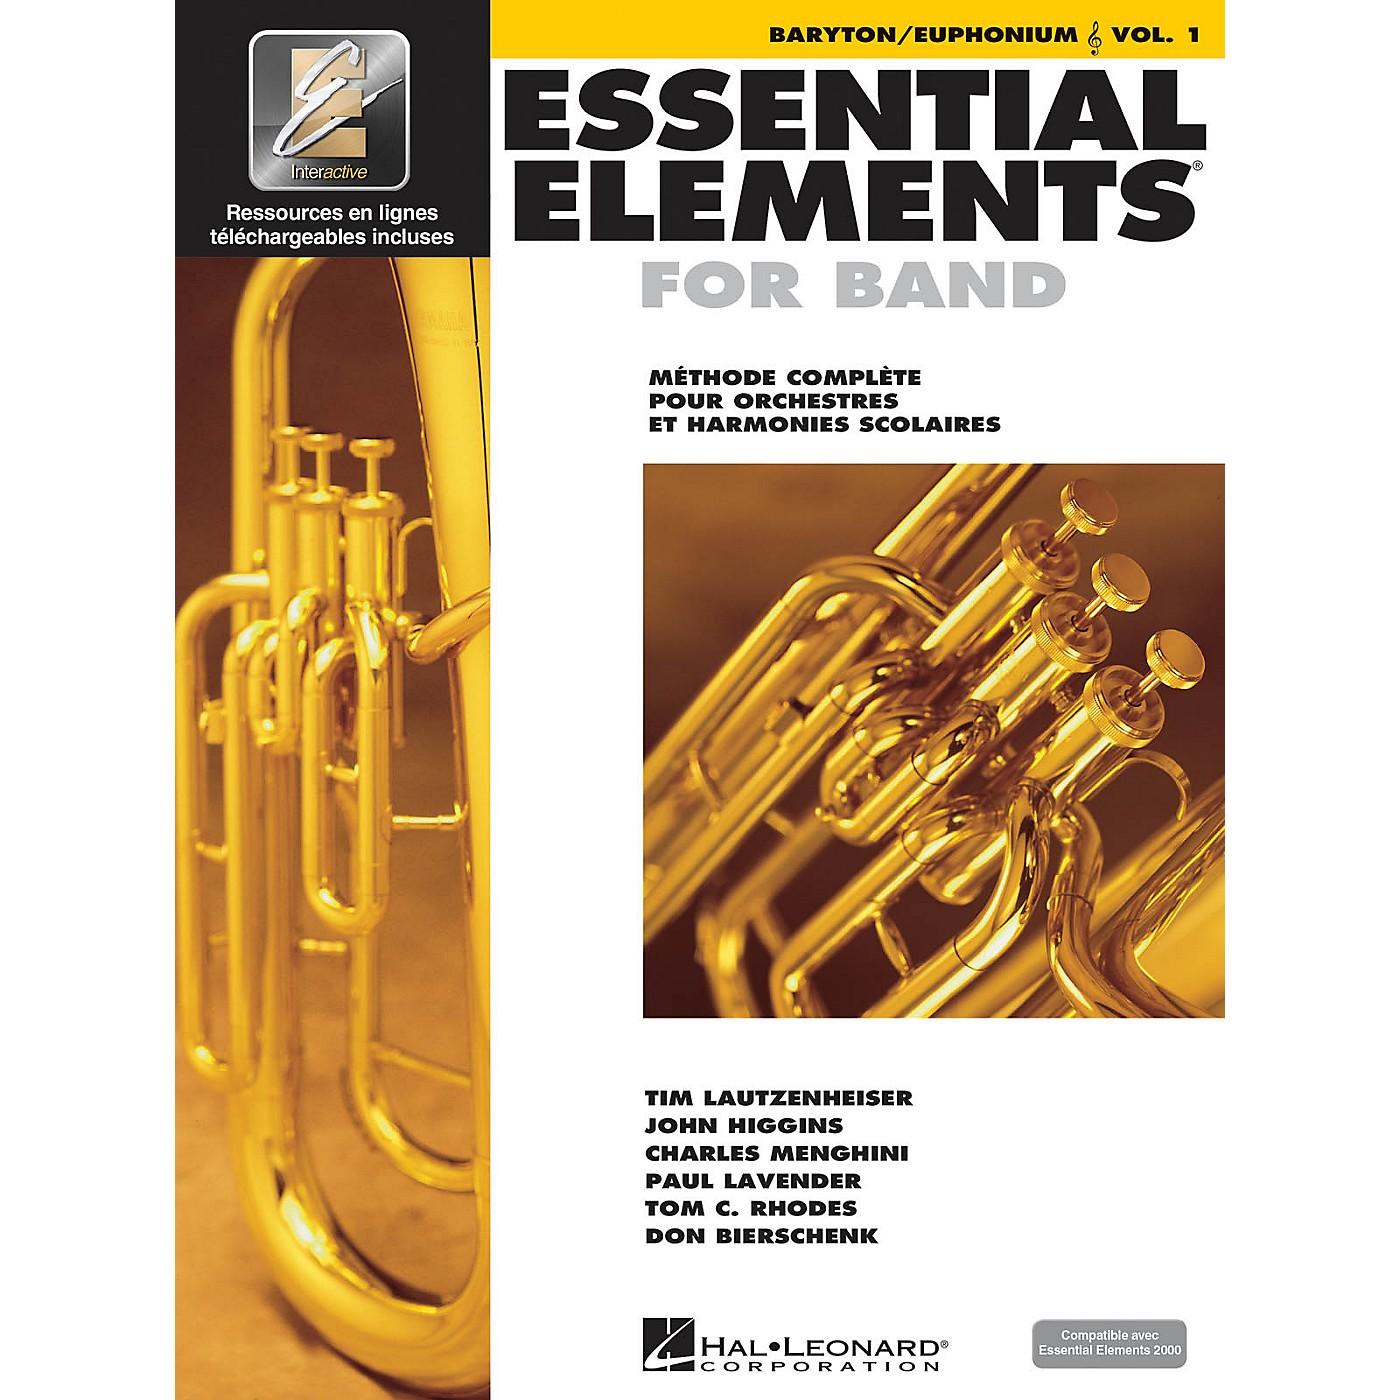 Hal Leonard FRENCH EDITION Essential Elements EE2000 Baritone/Euphonium T.C. (Book/Online Media) thumbnail